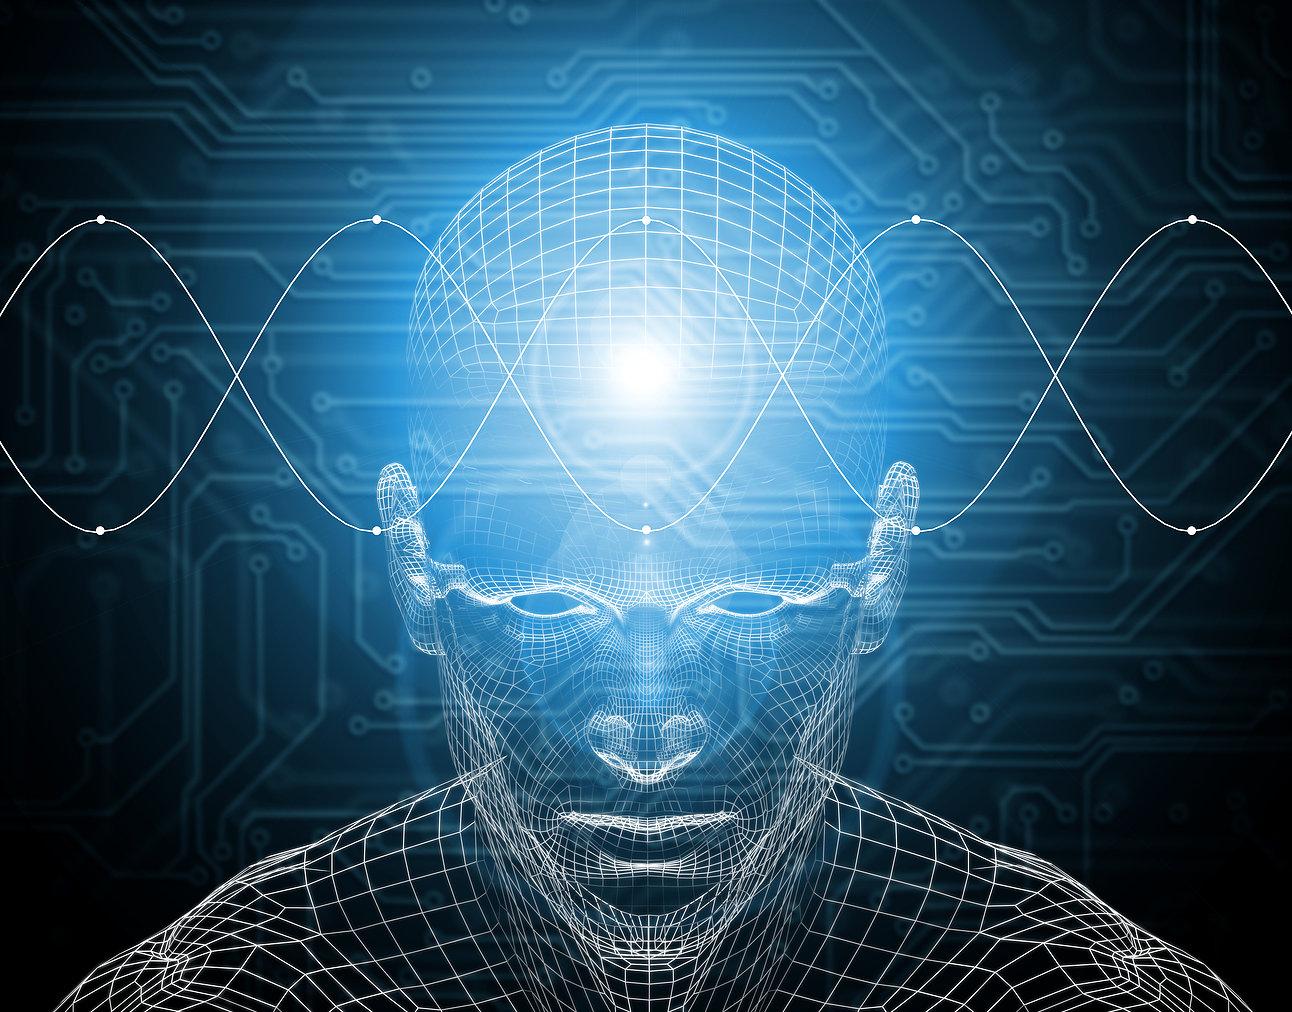 Fiserv: 'AI Most Promising For Internal Origination Workflows'